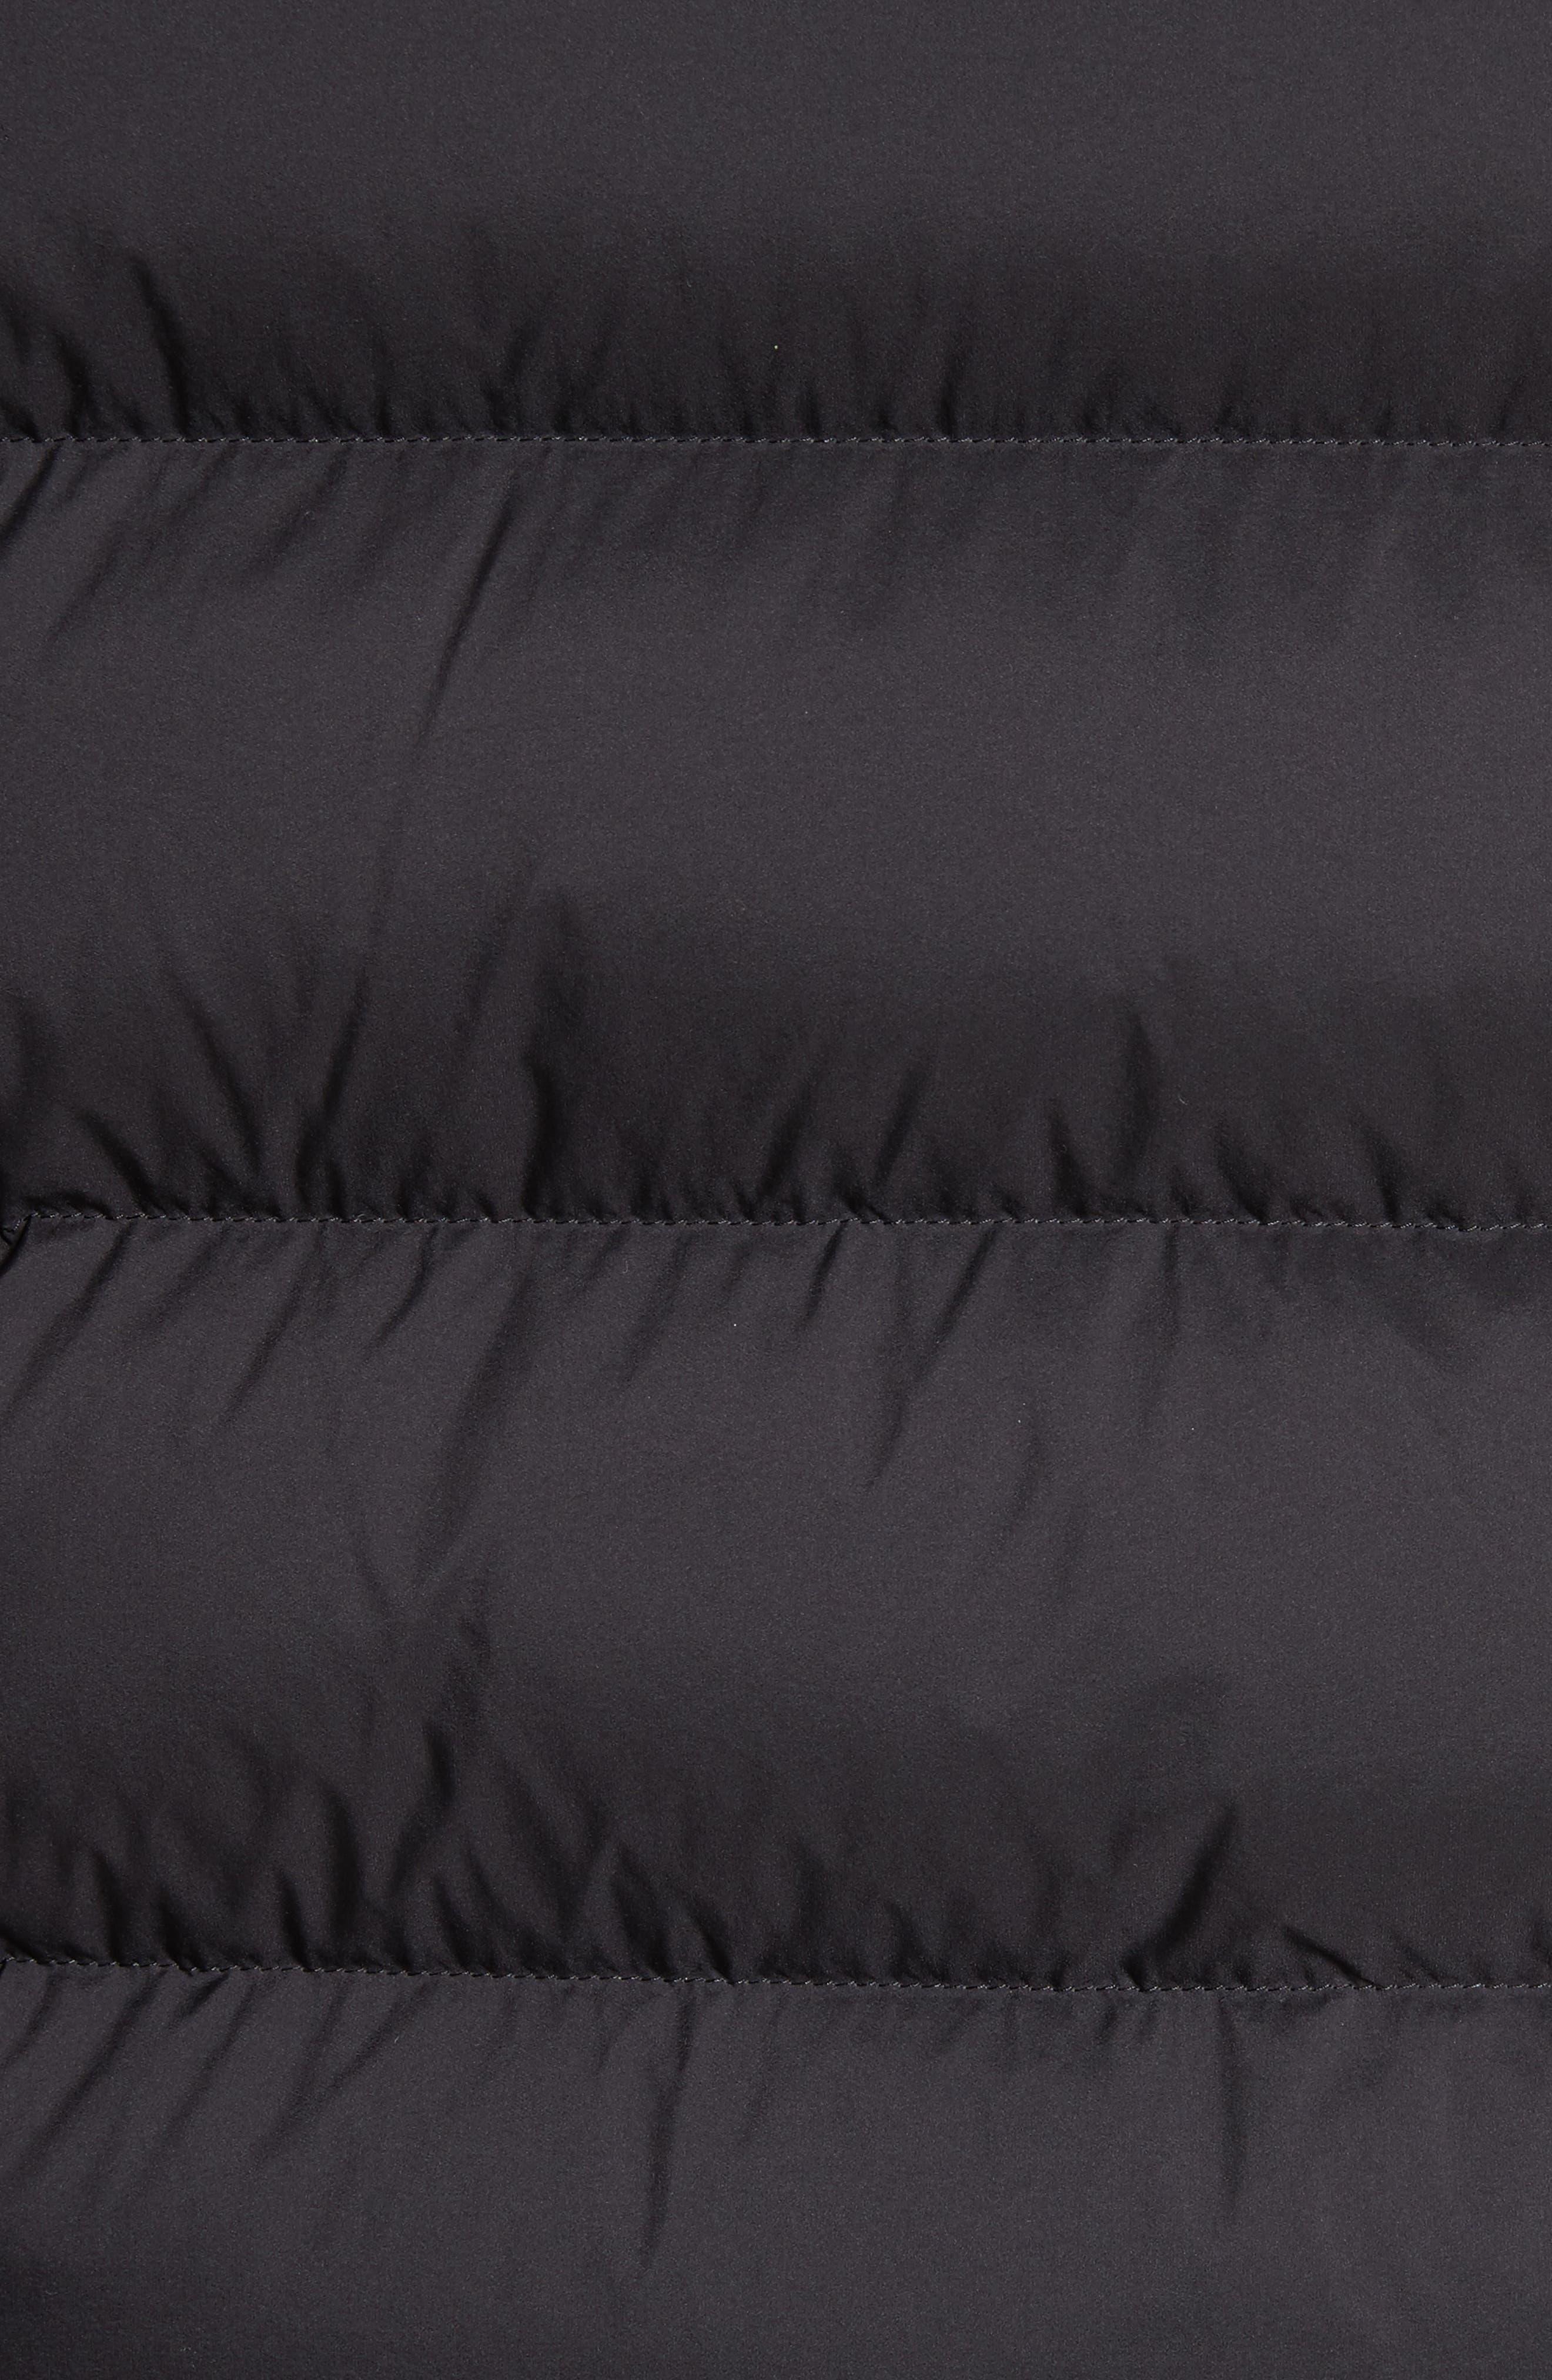 Hartley Convertible Down Jacket,                             Alternate thumbnail 5, color,                             001